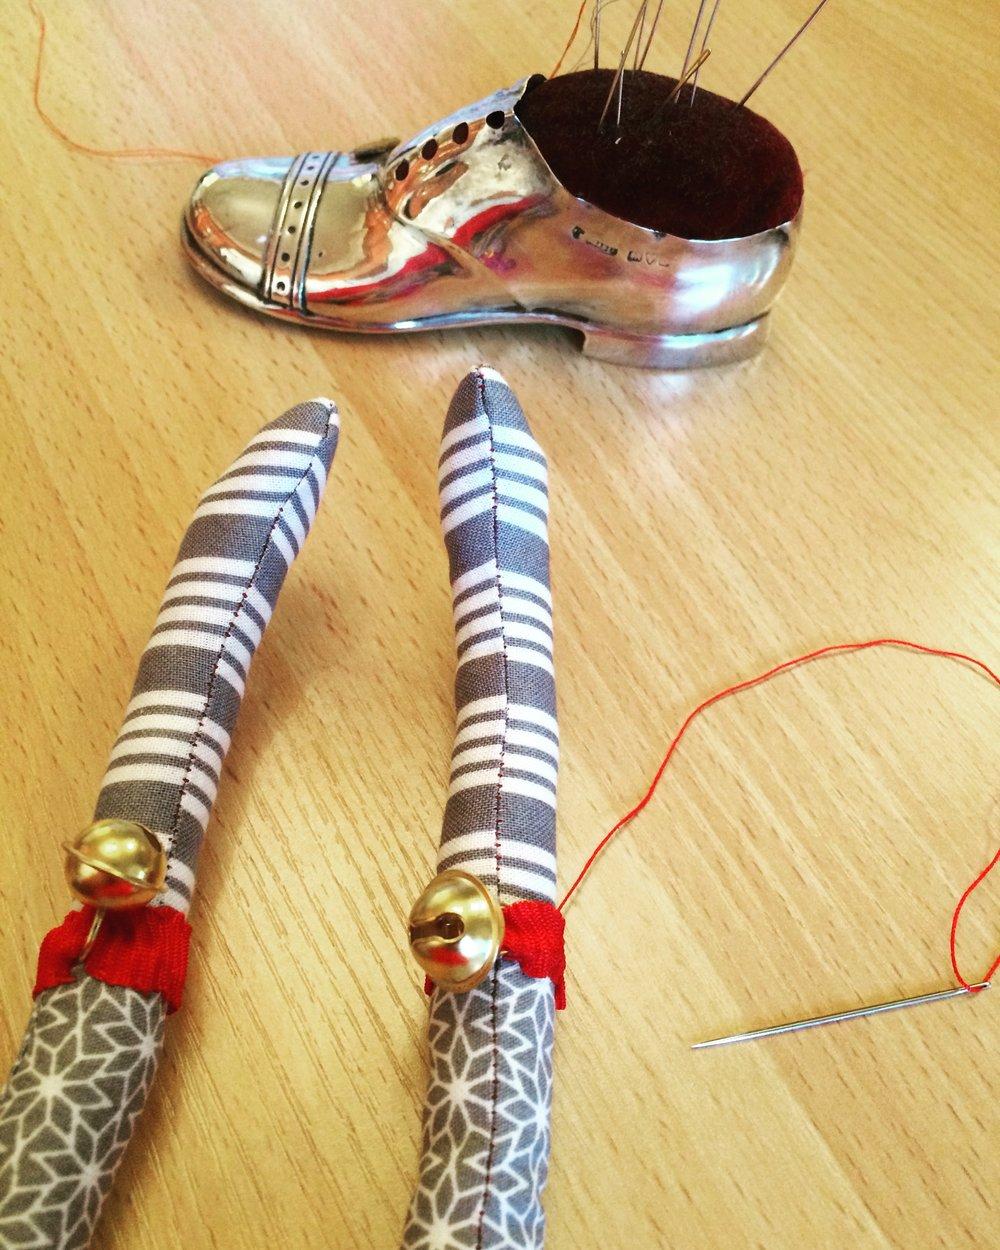 Patchwork Santa Boots.JPG